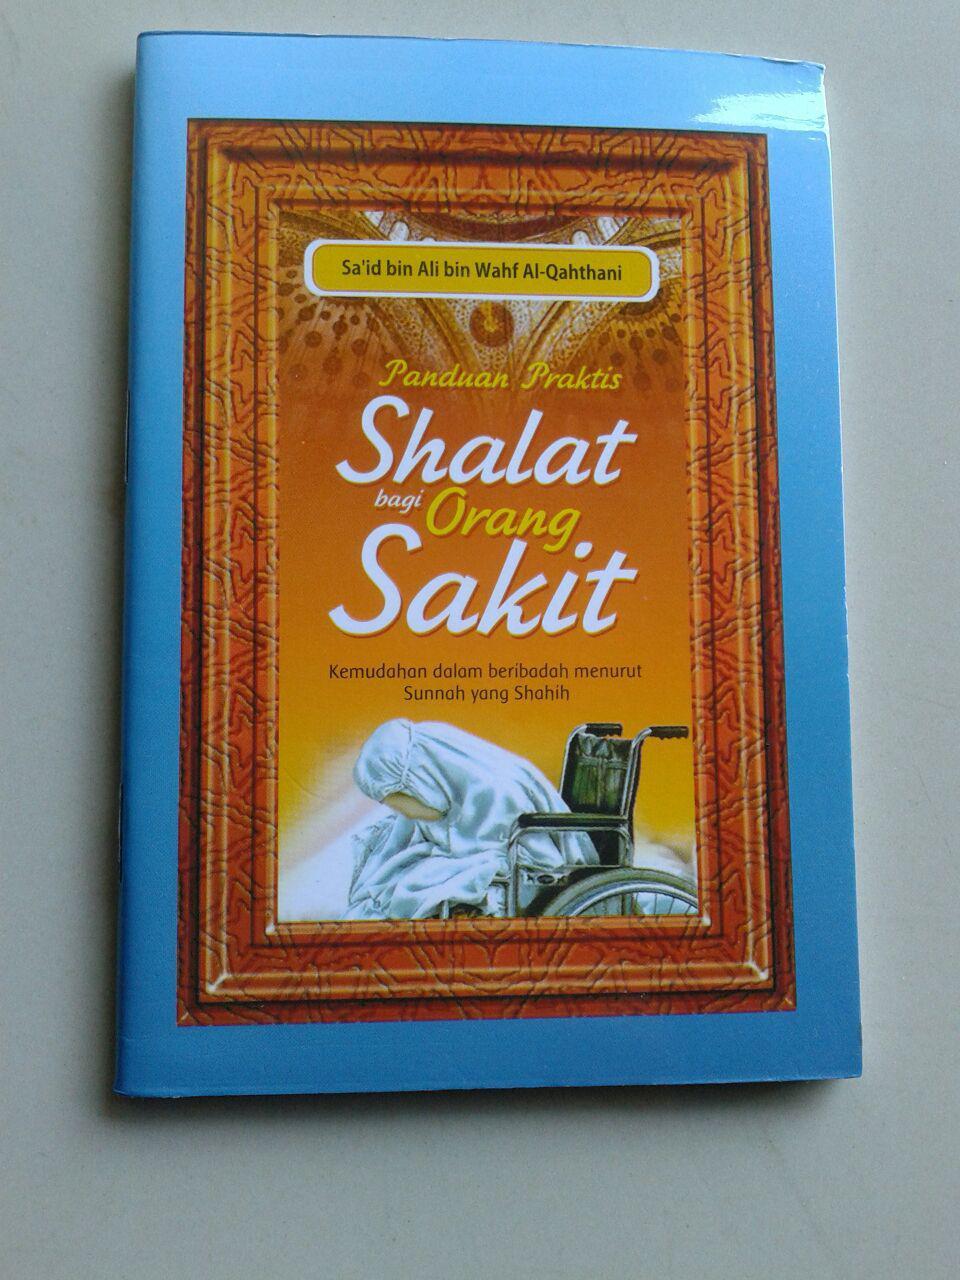 Buku Saku Panduan Praktis Shalat Bagi Orang Sakit Menurut Sunnah cover 2